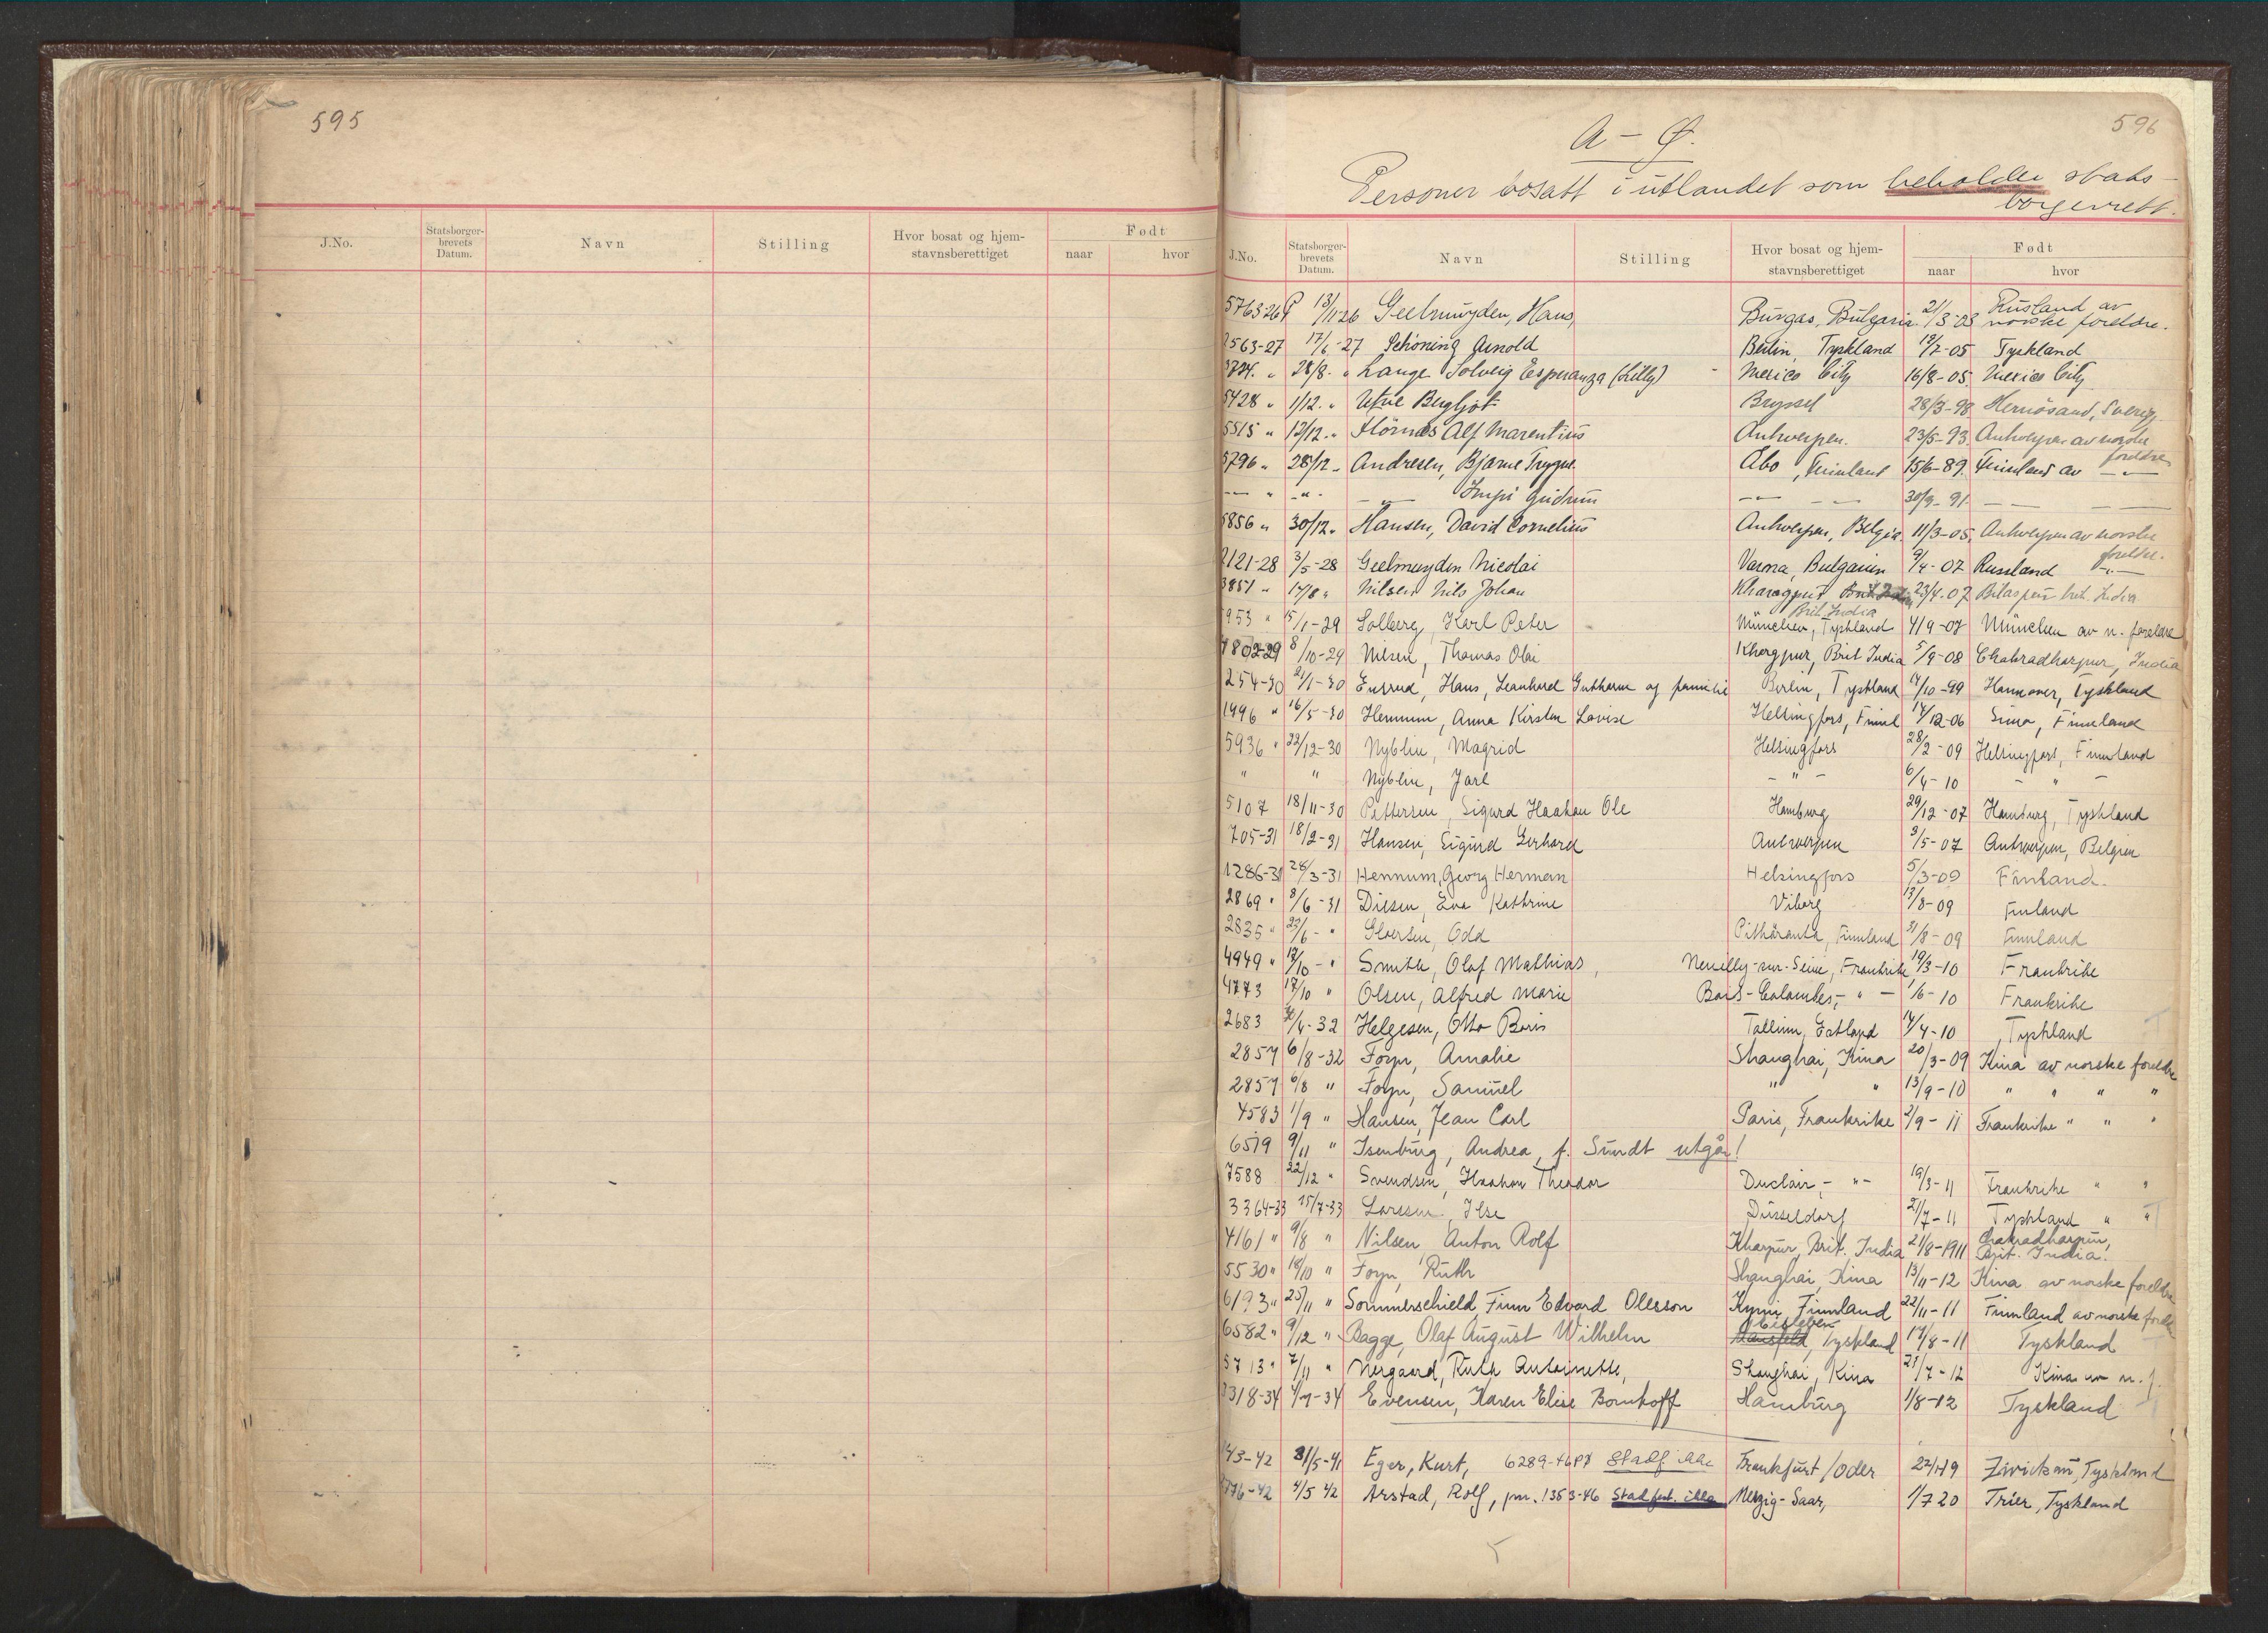 RA, Justisdepartementet, 3. politikontor P3, C/Cc/L0001: Journal over statsborgersaker, 1891-1946, s. 595-596